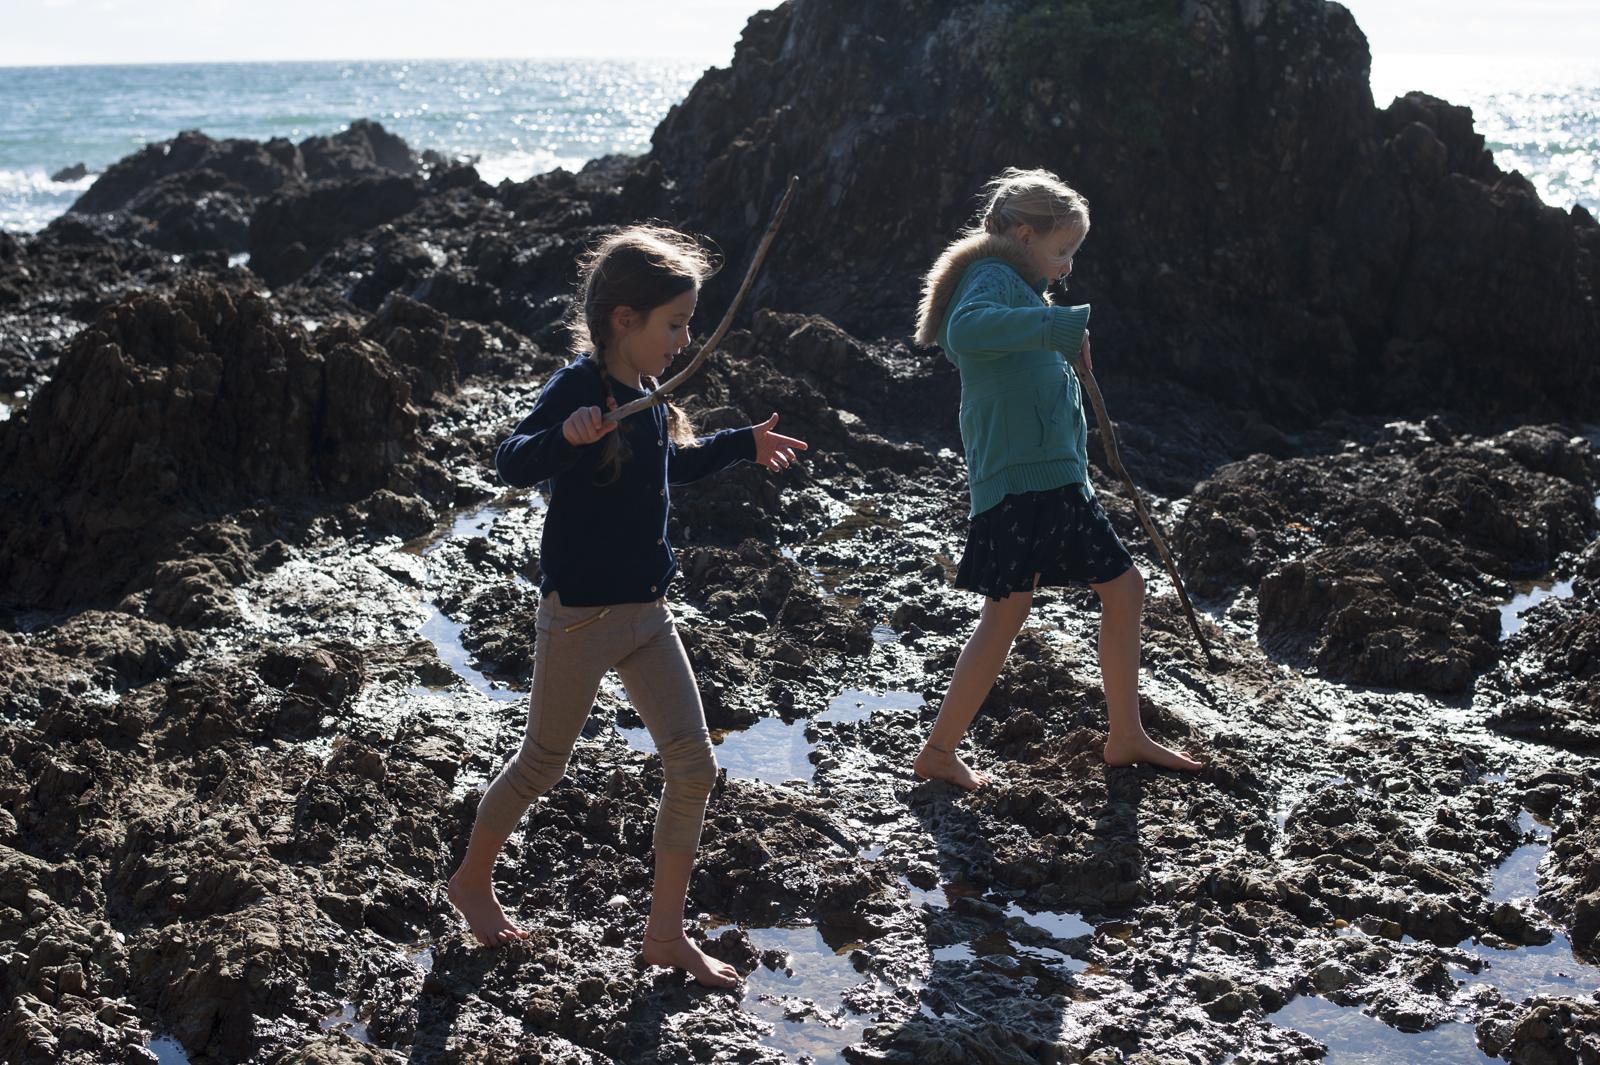 You get tough feet growing up on an island